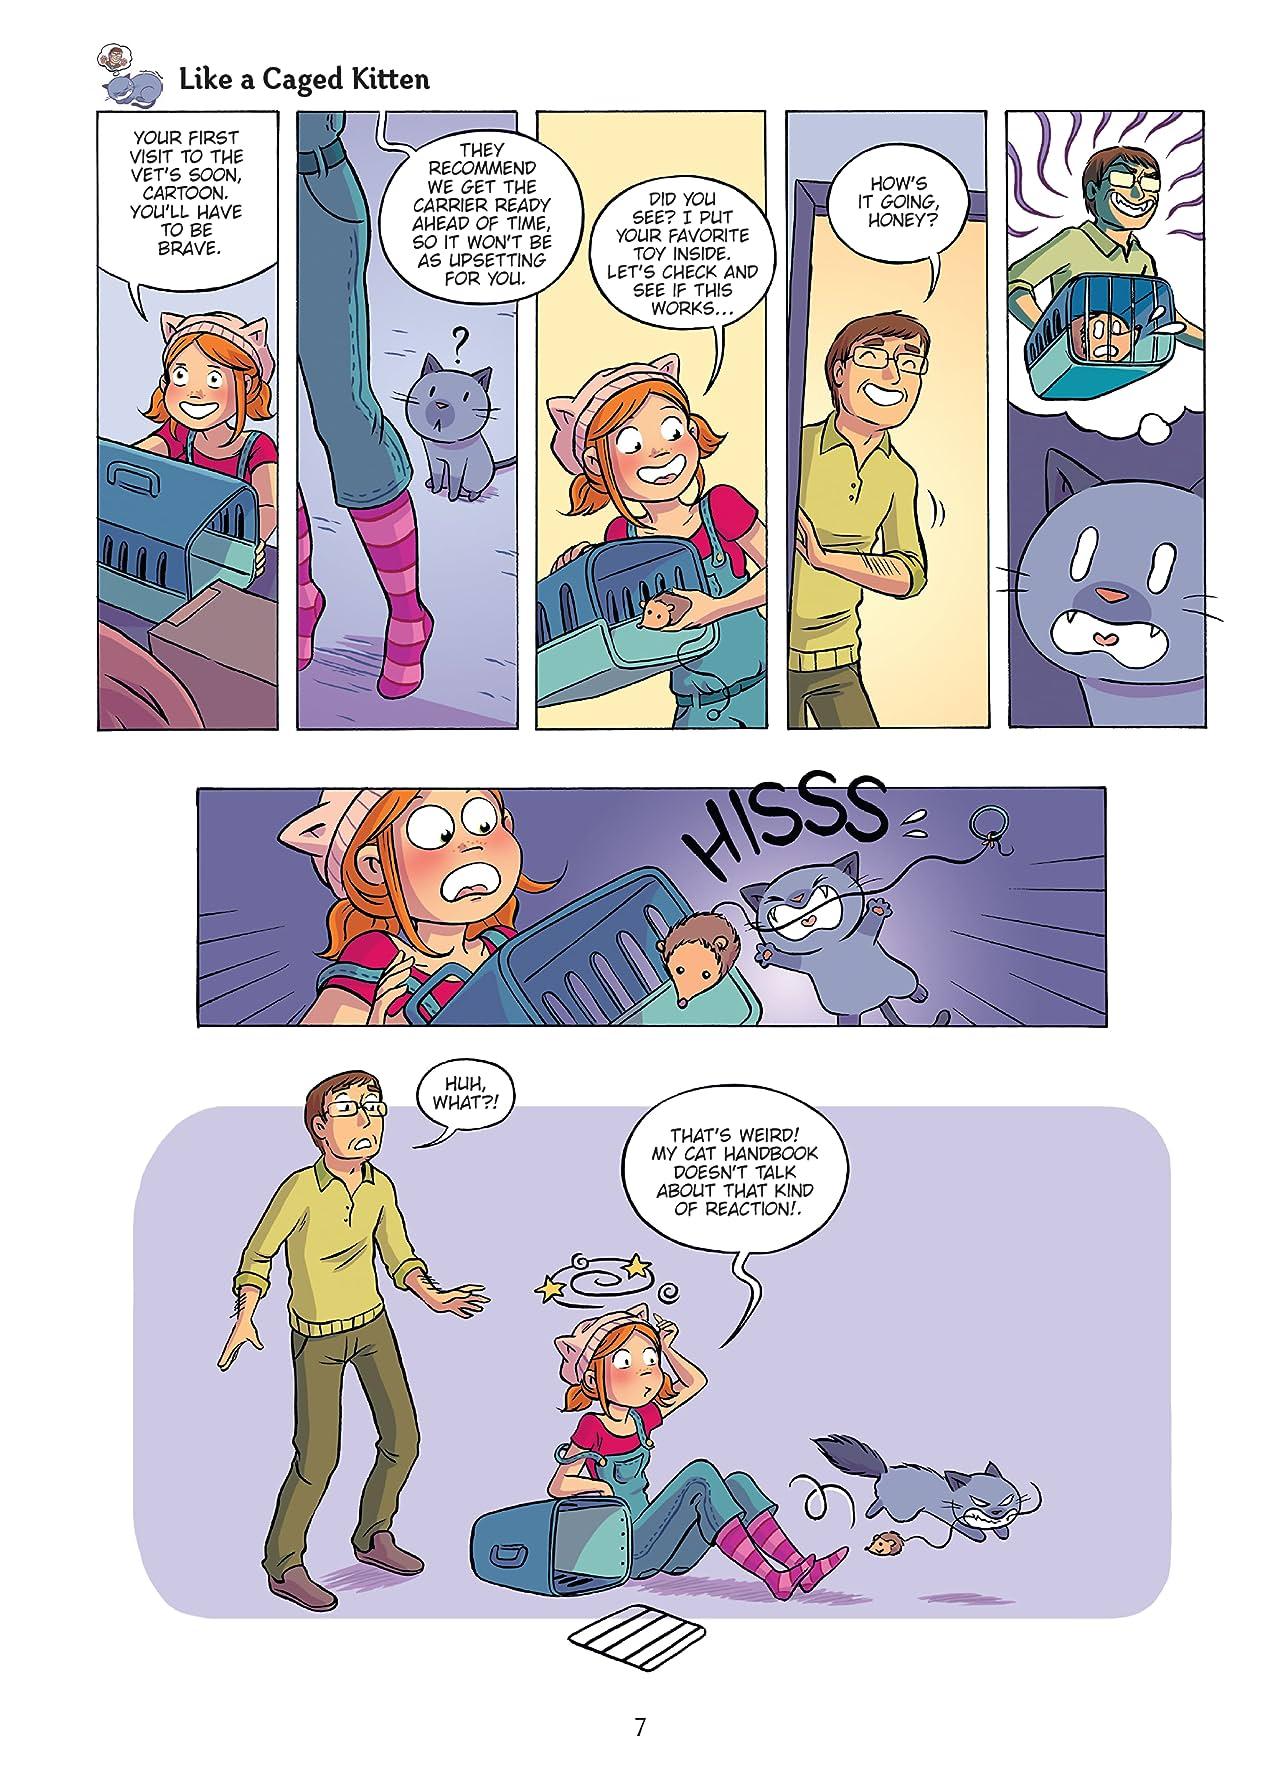 Chloe & Cartoon Tome 2